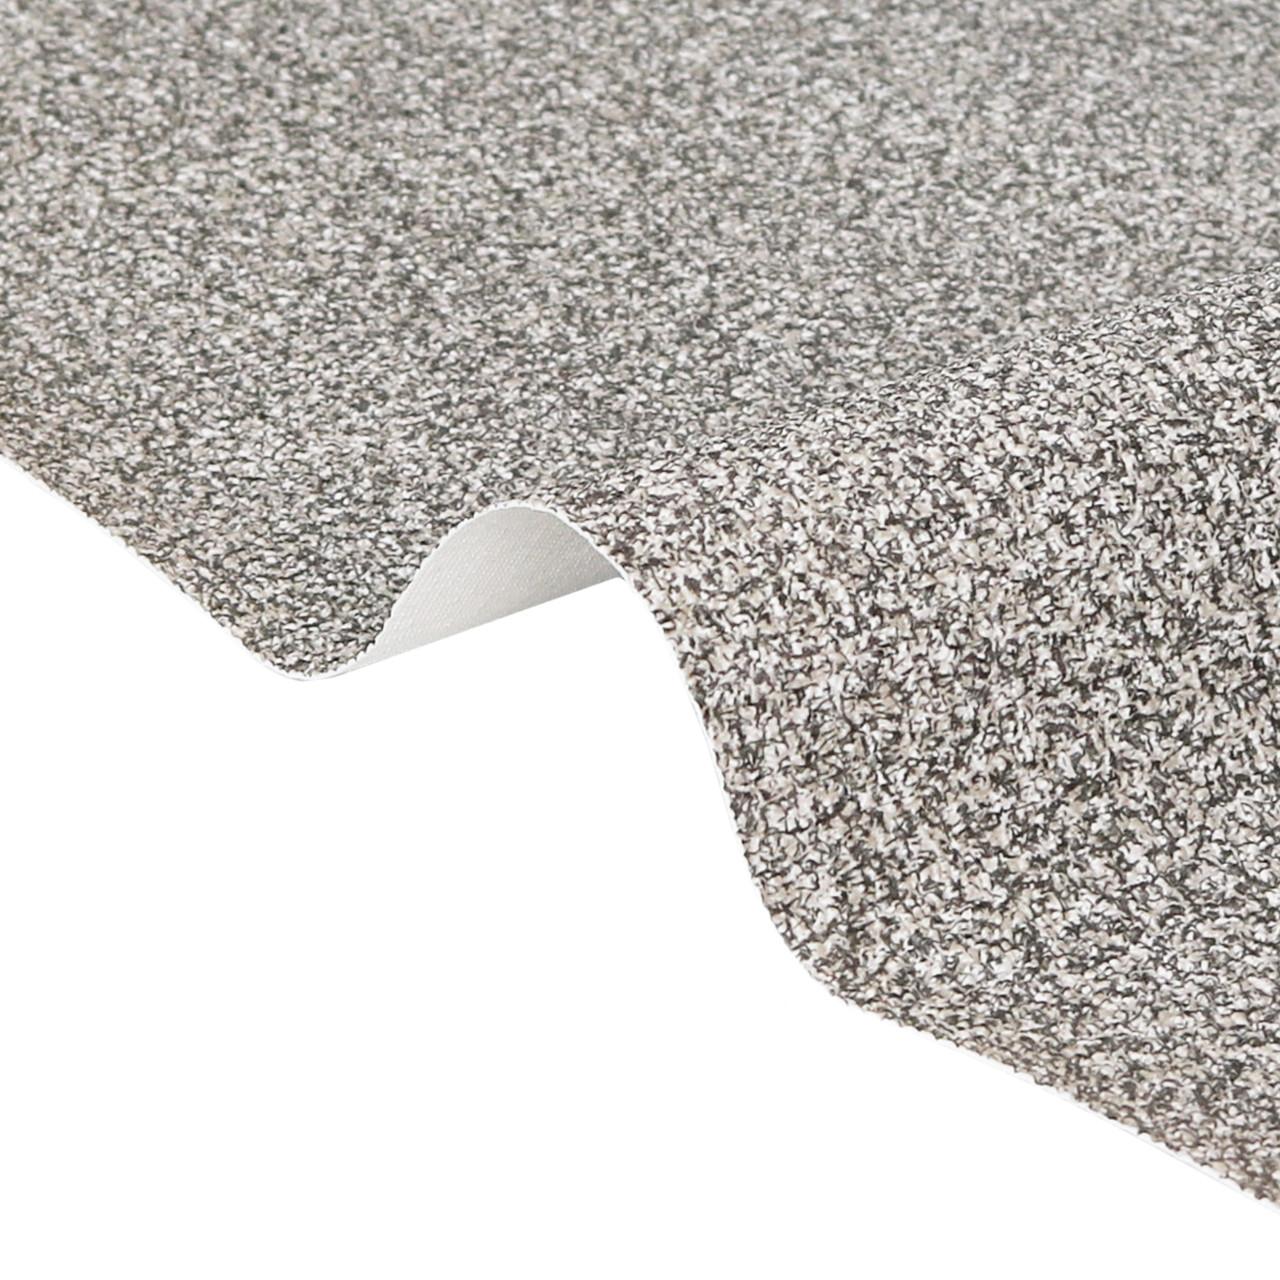 Nautolex Shark Marine Vinyl Deck And Van Flooring 72 Wide Per Linear Foot